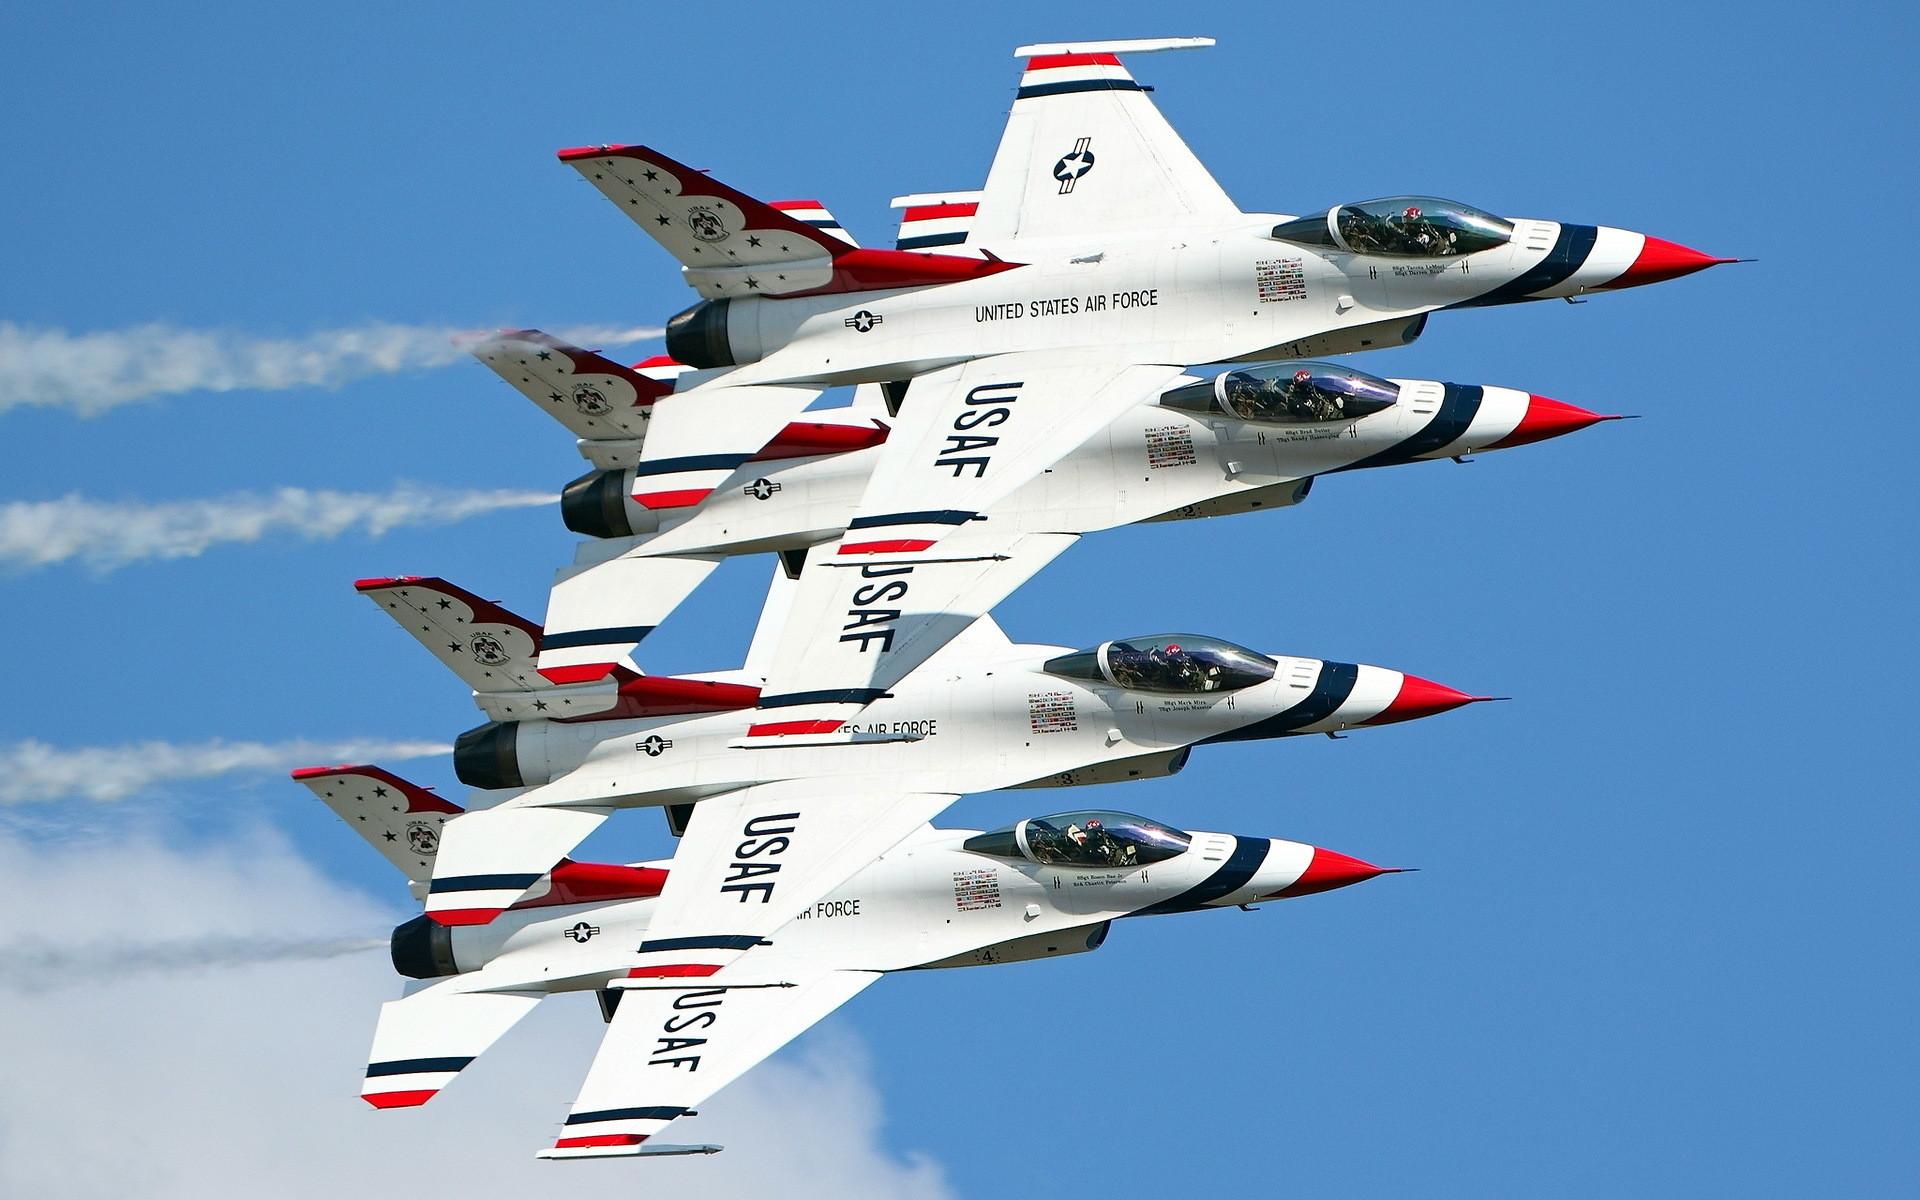 … us air force at show widescreen hd wallpaper for desktop …